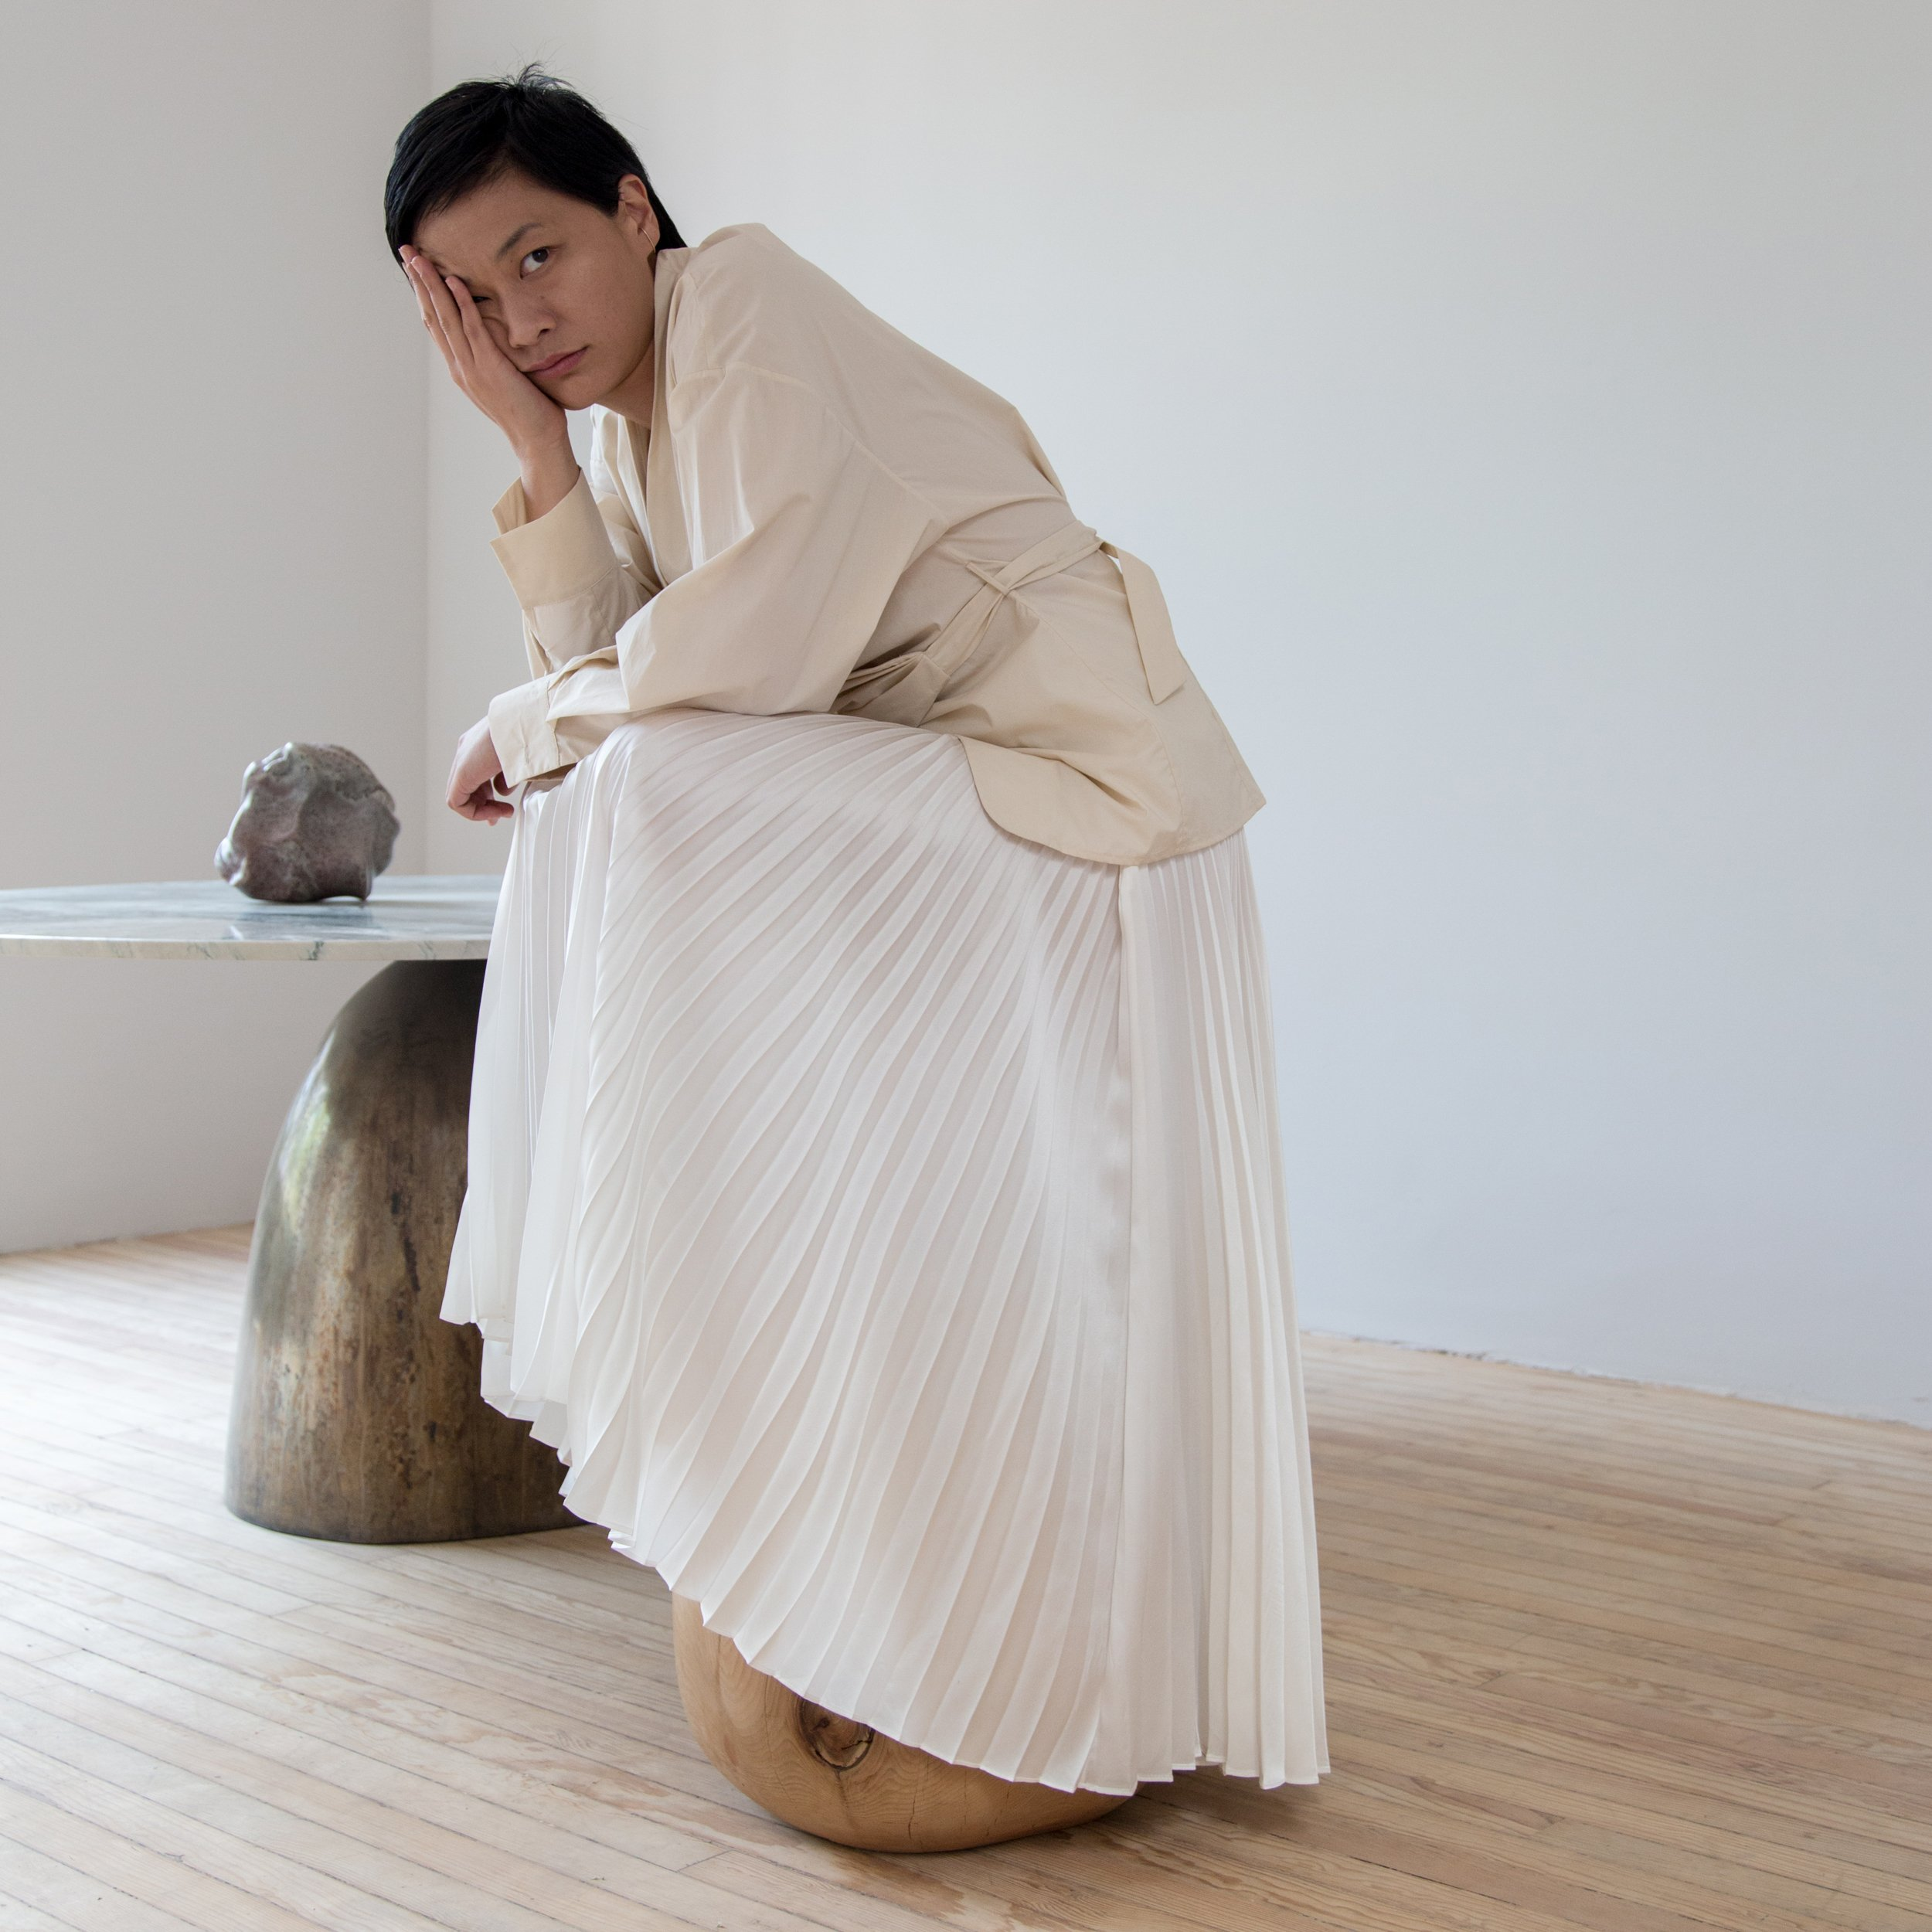 https://shainamote.com/blogs/journal/su-wu